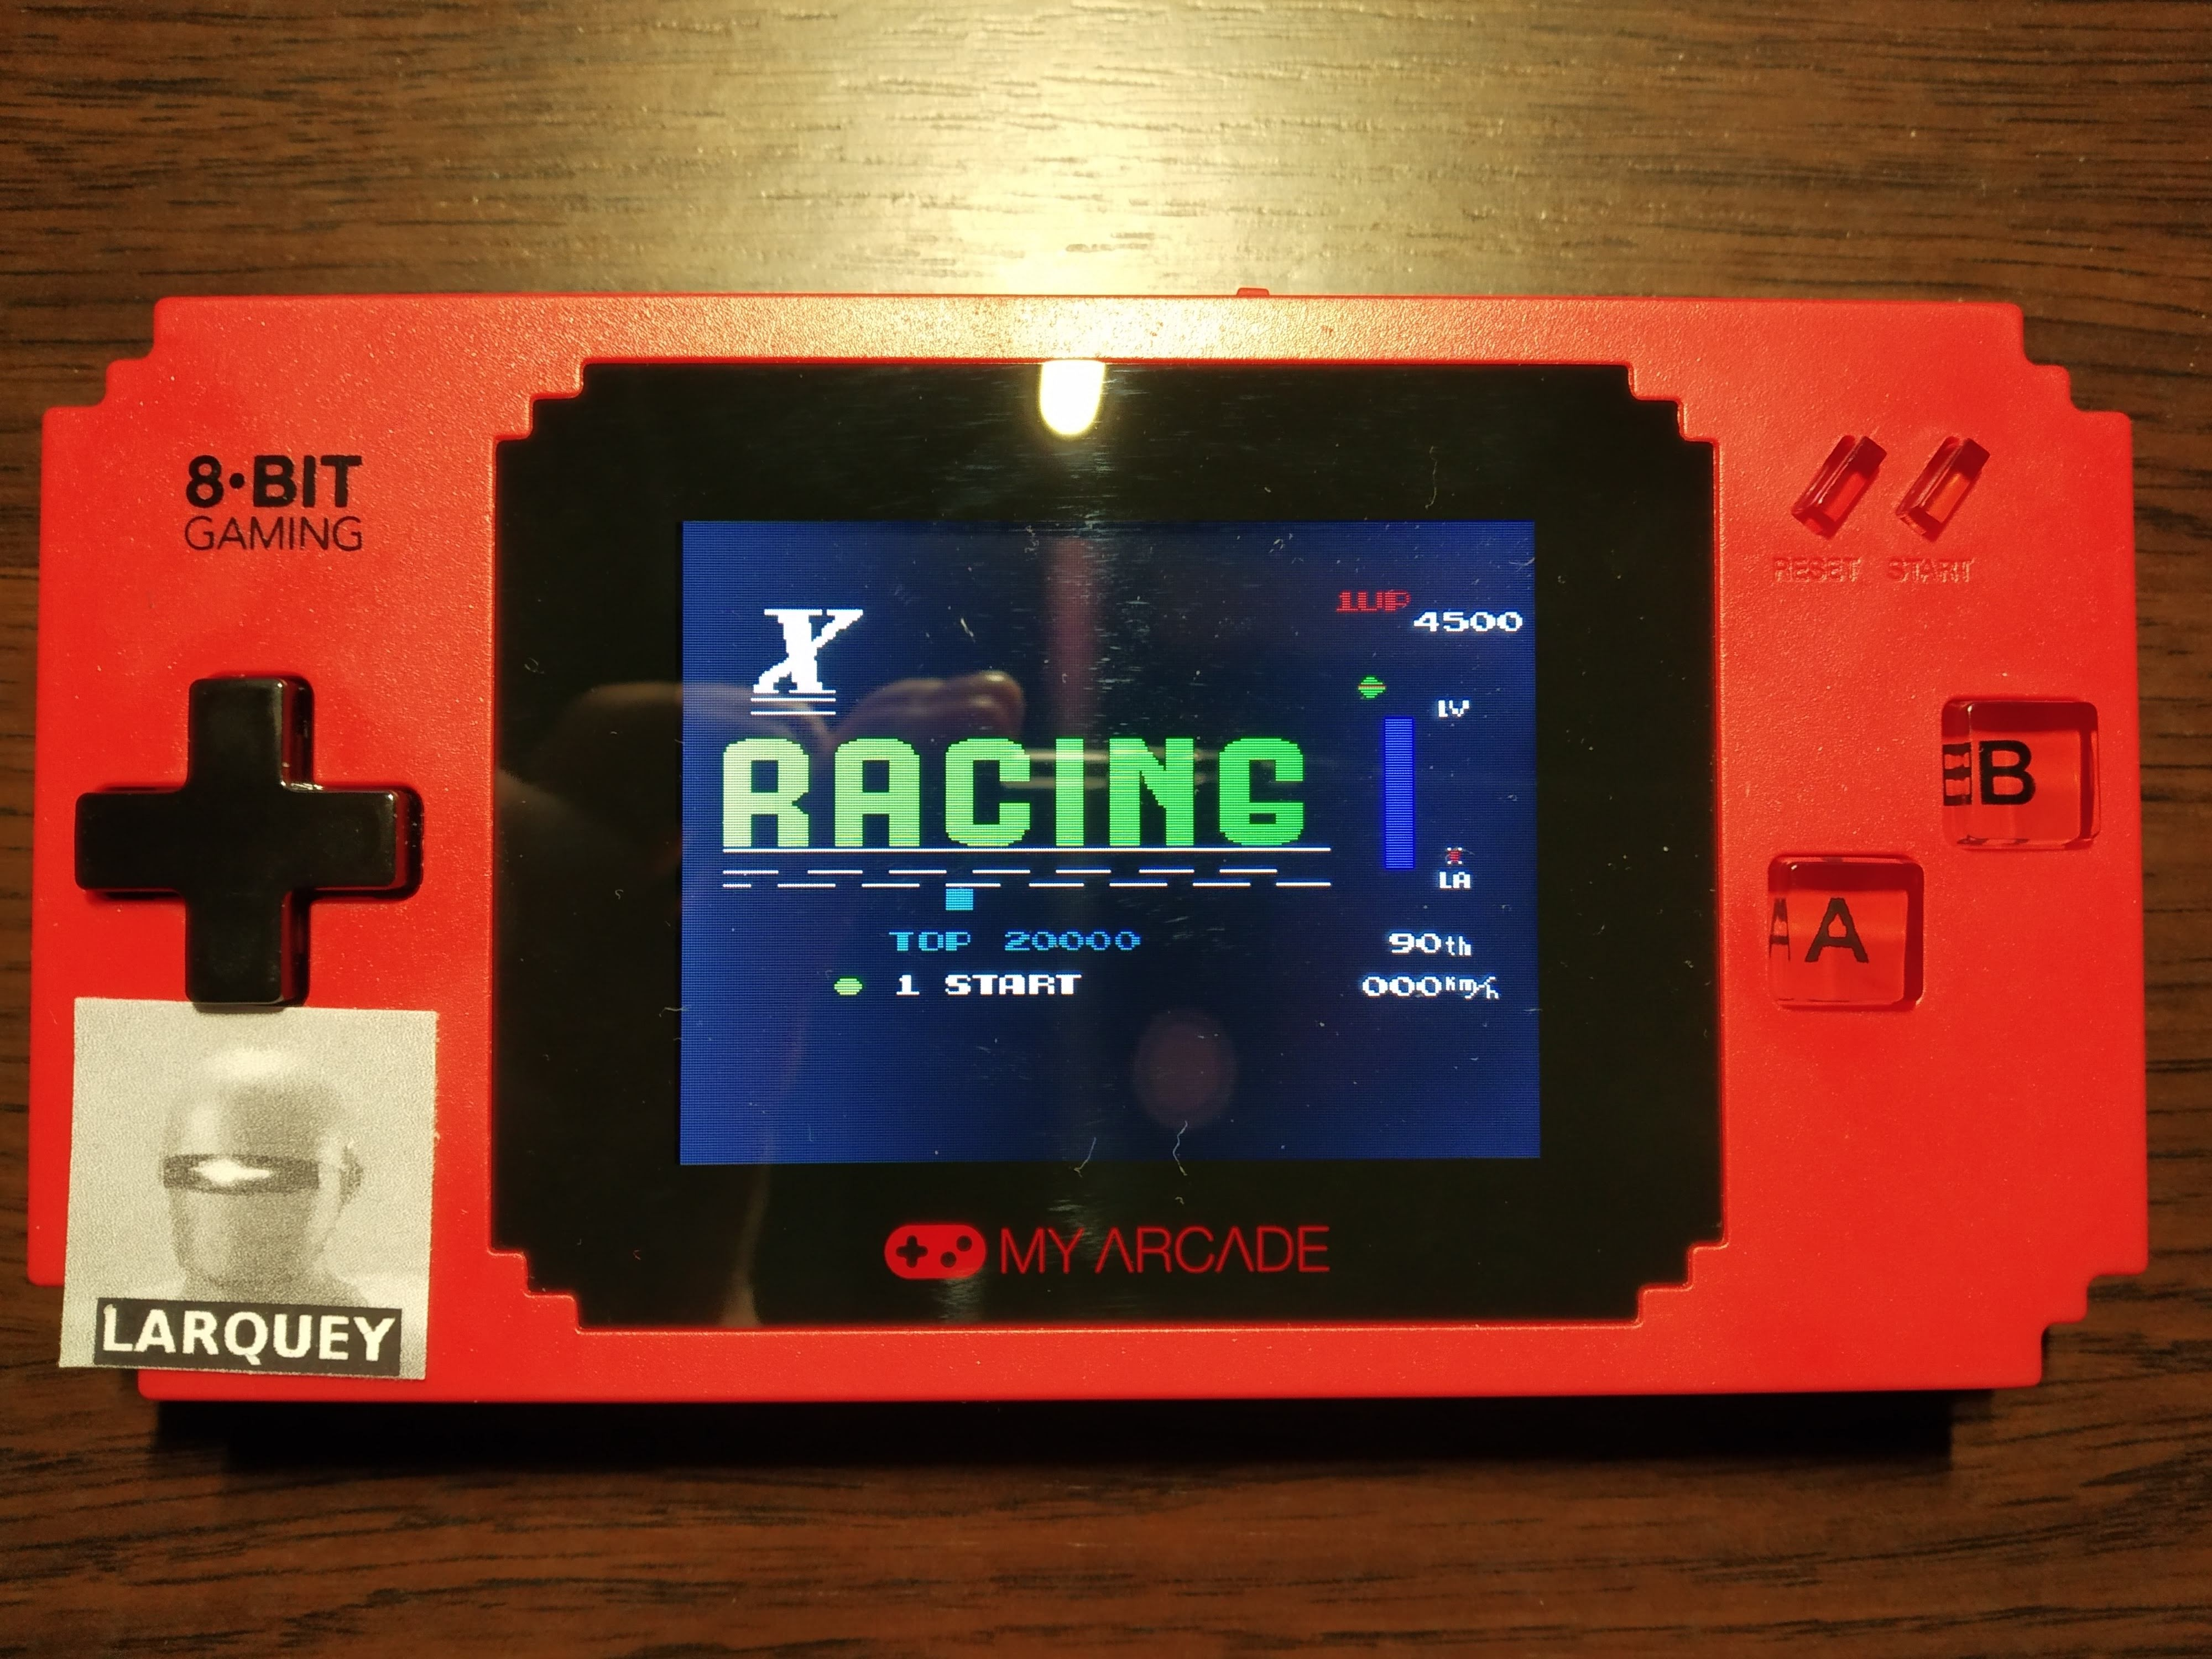 My Arcade: X Racing 4,500 points